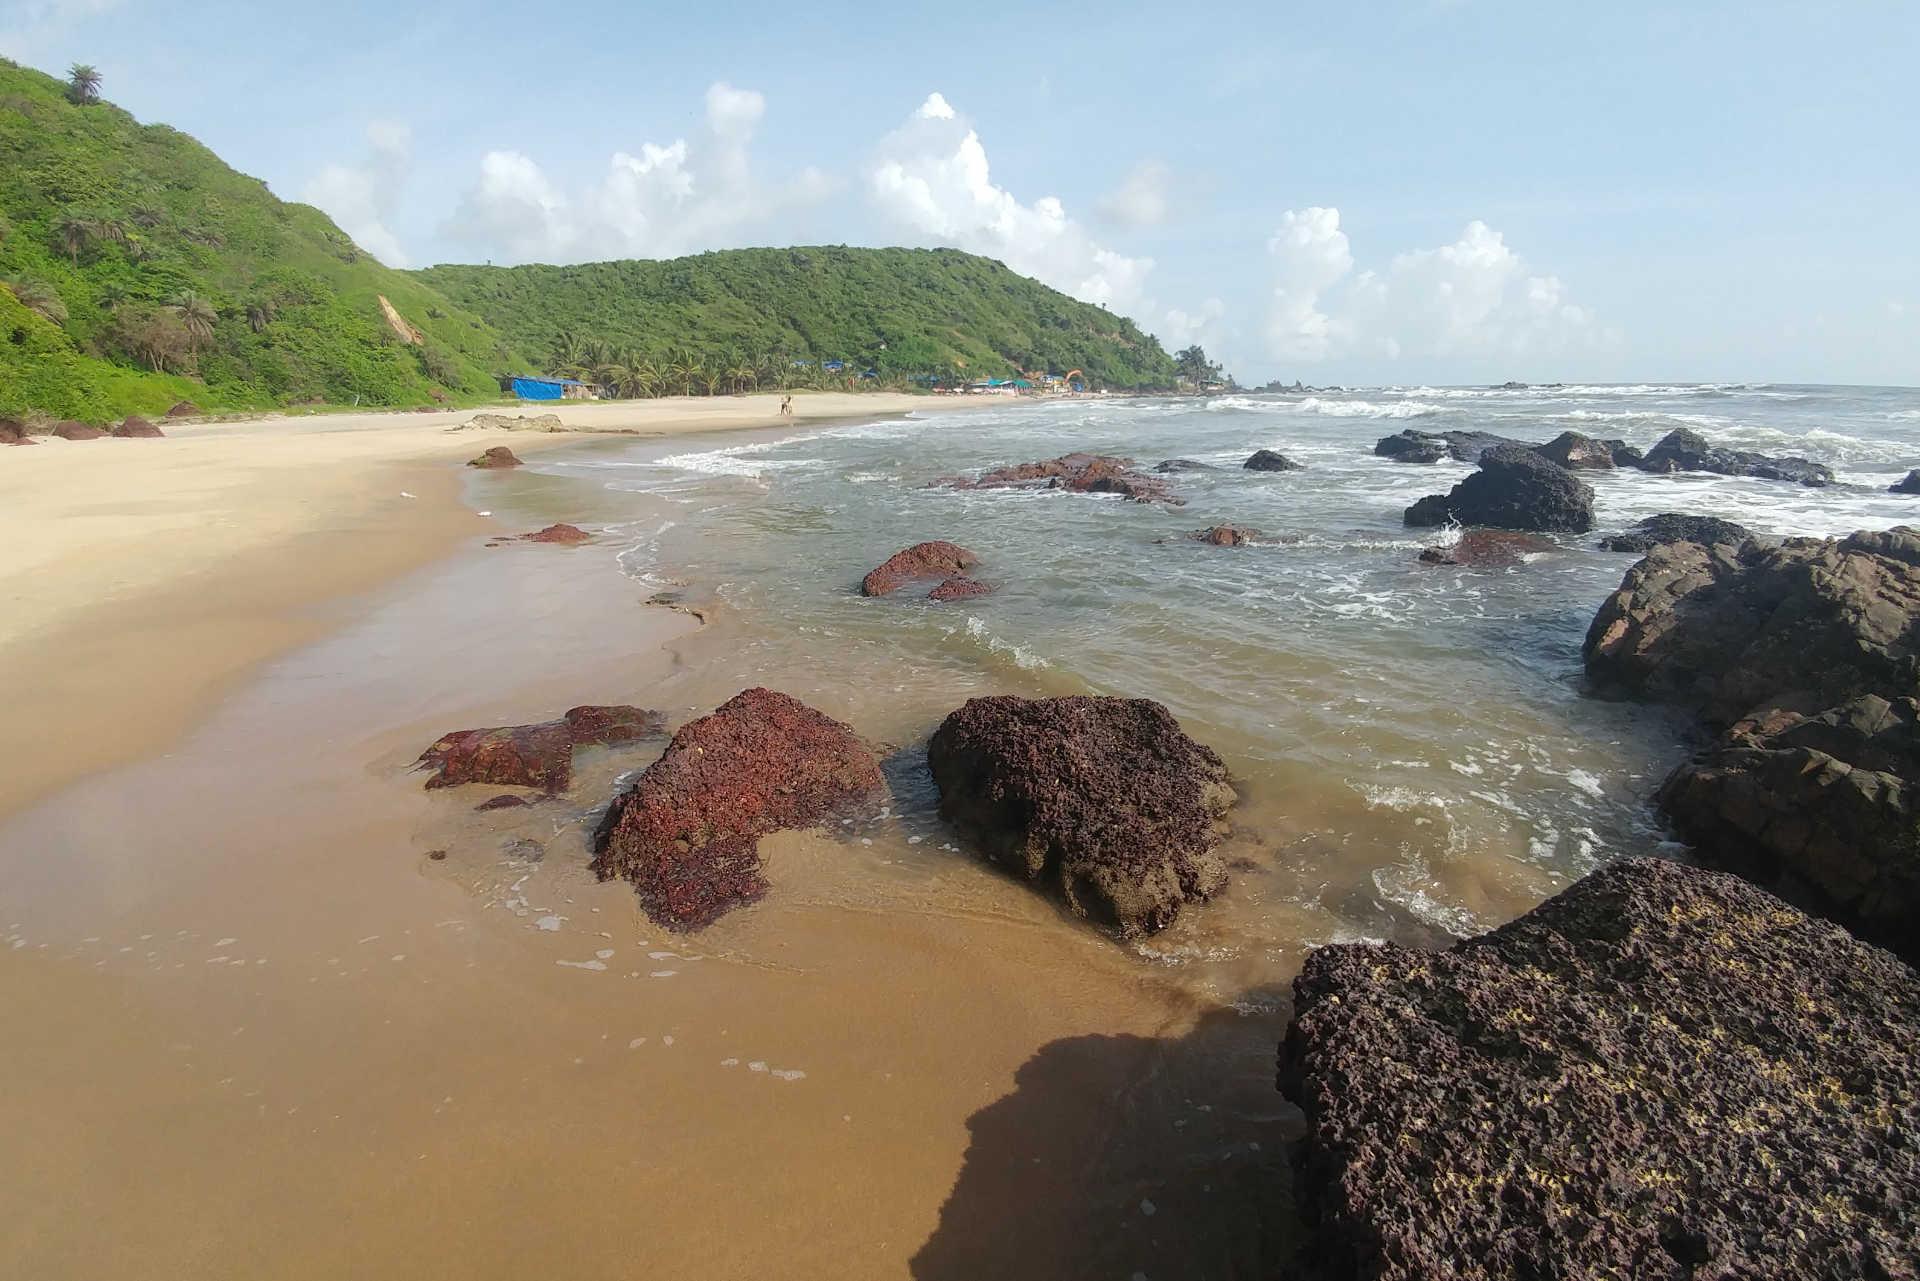 arambol beach topless